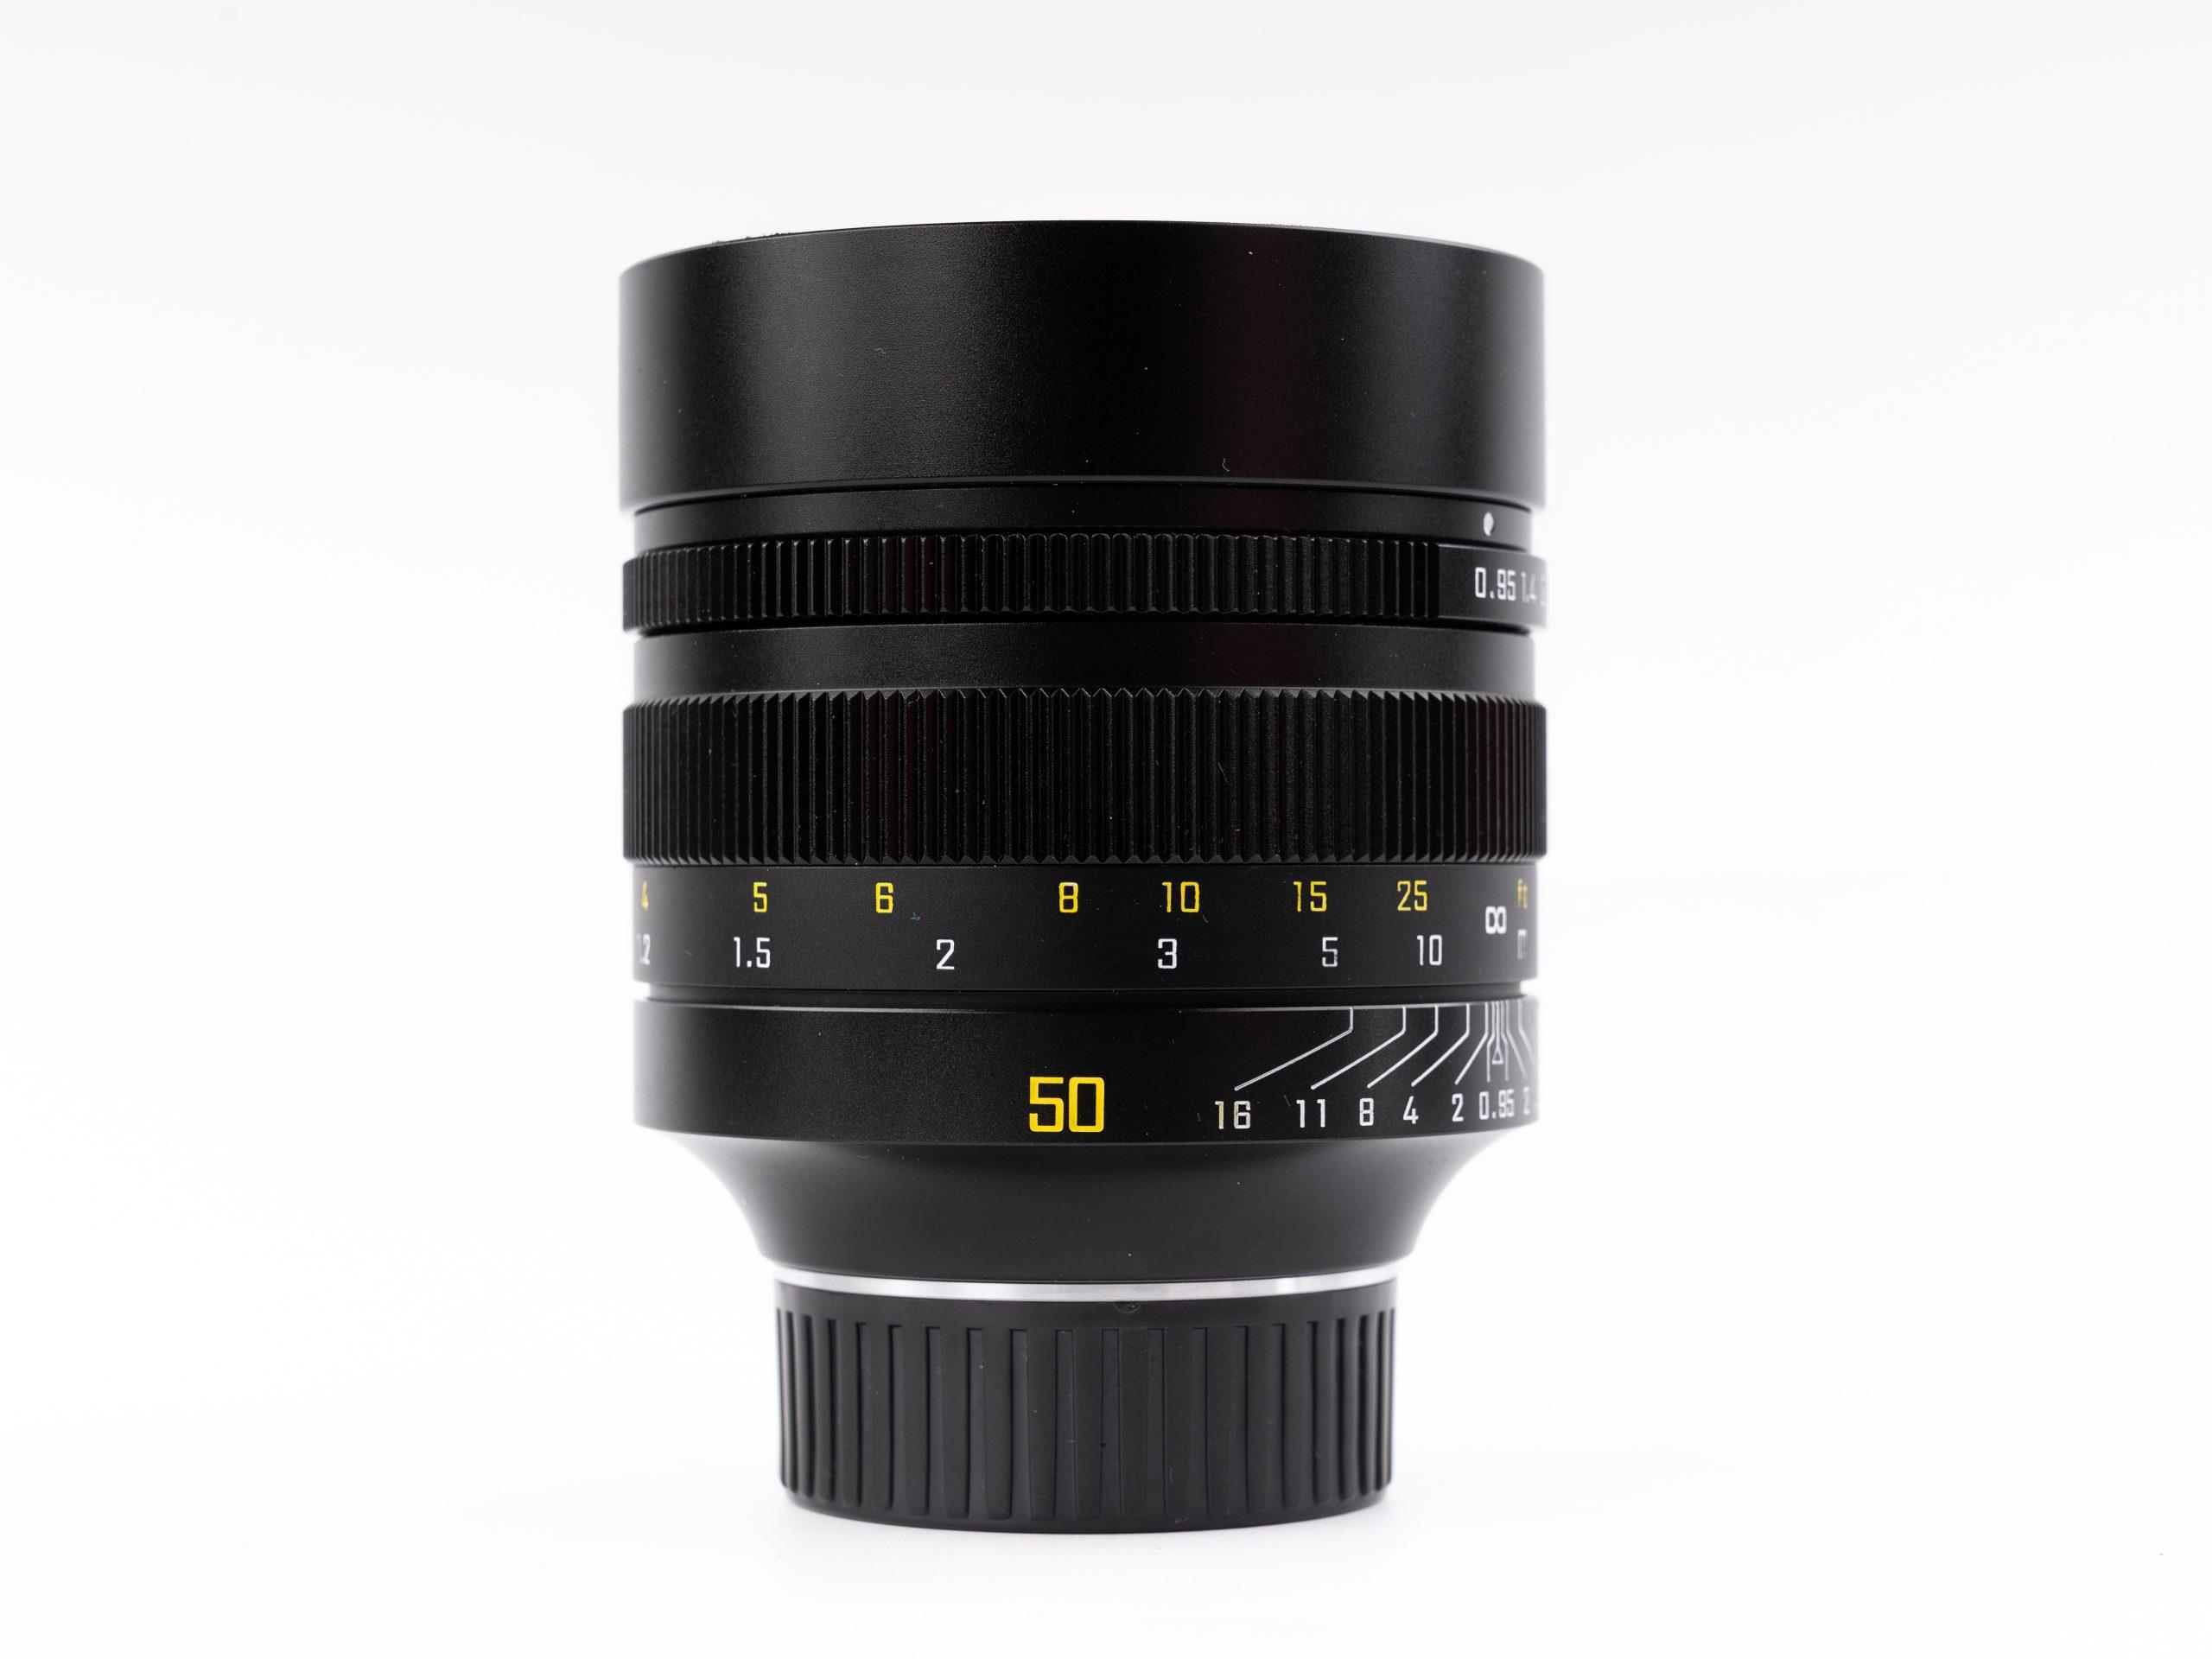 ZY Optics 50/0.95 lens (Pic: ZY Optics)